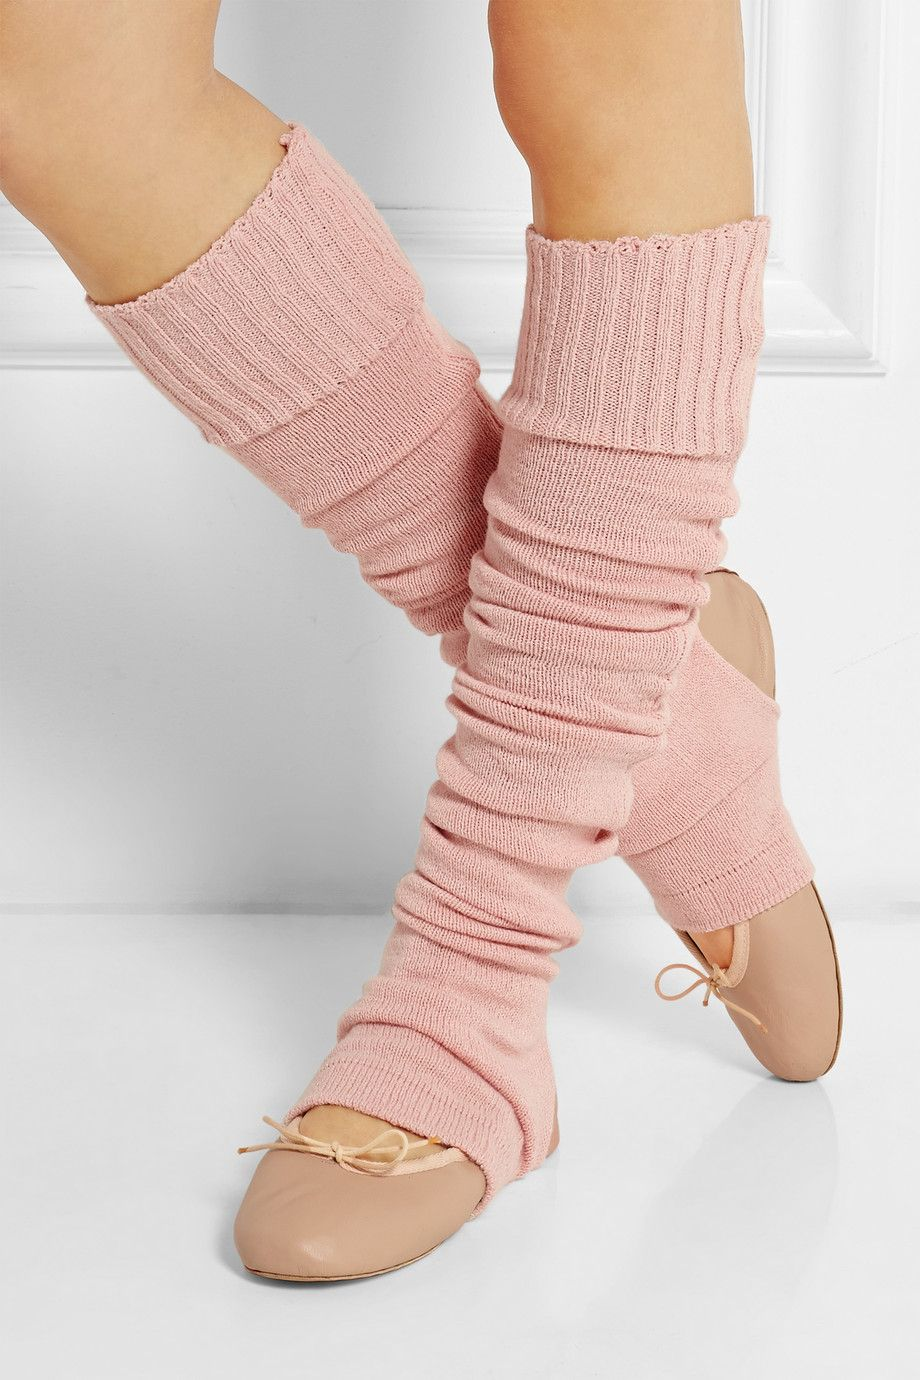 Ballet Beautiful|Lily knitted jersey legwarmers |NET-A-PORTER.COM